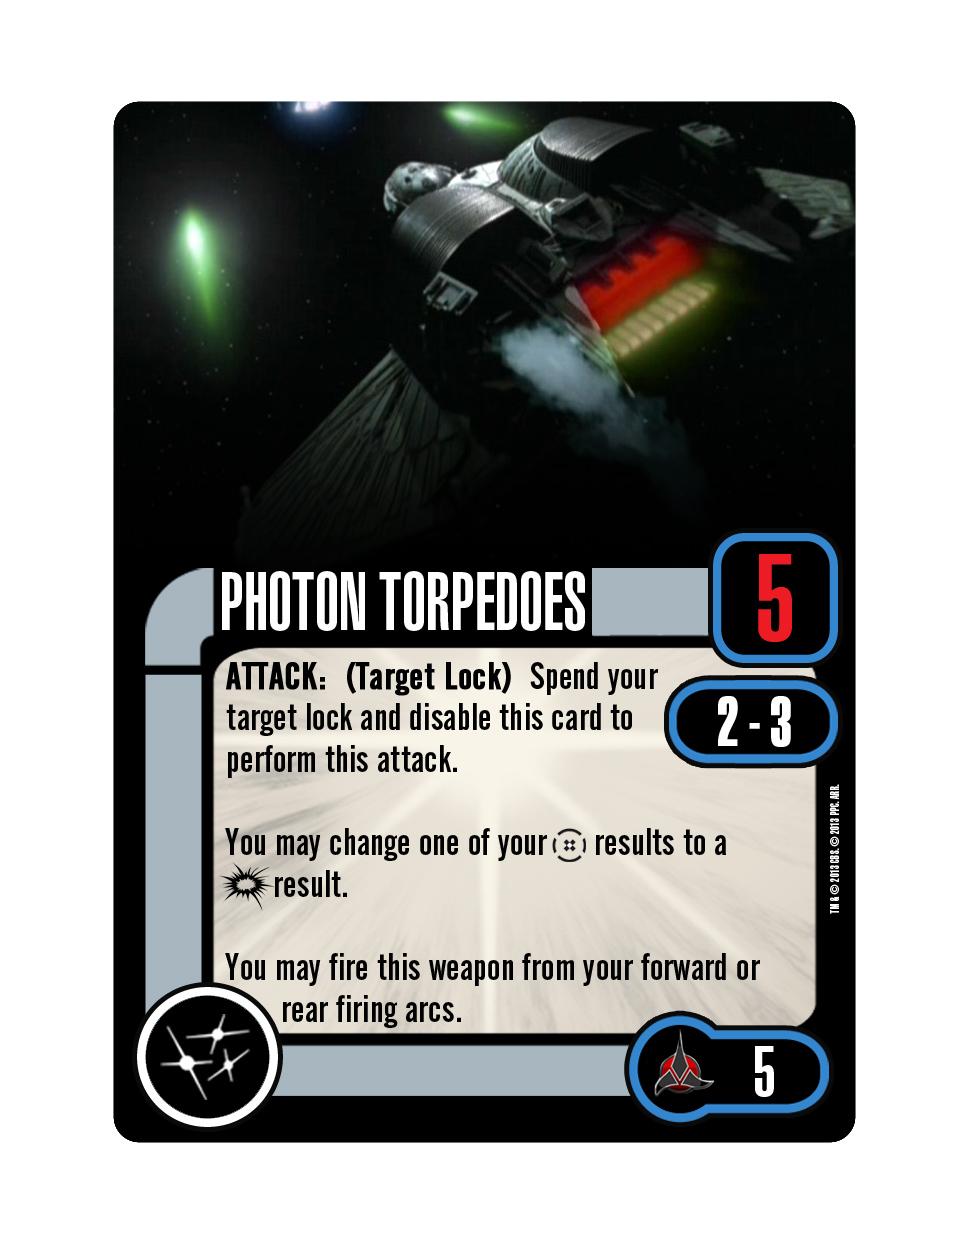 Klingon_Weapon_PhotonTorpedoes